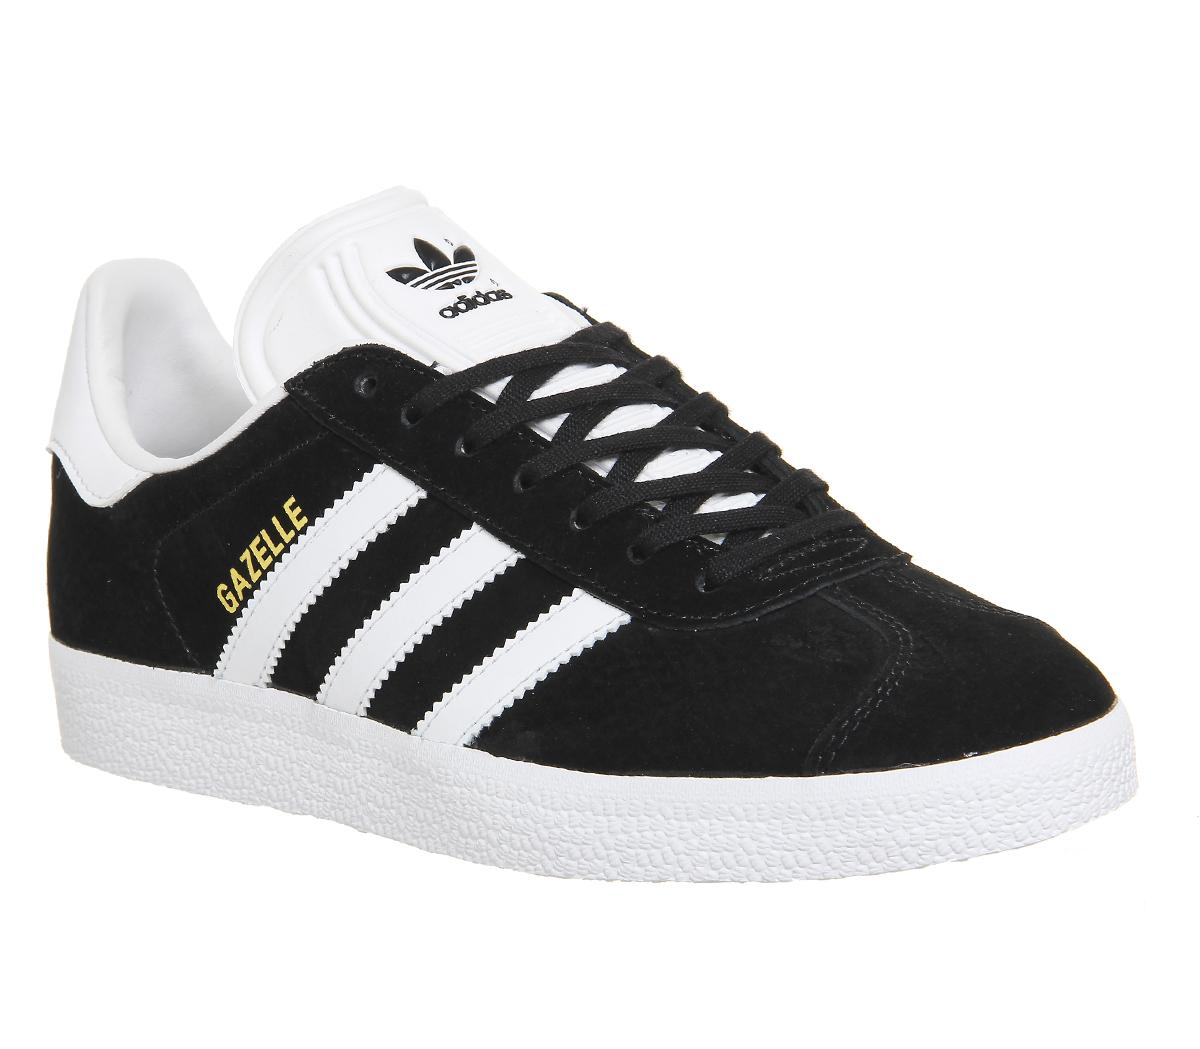 Adidas Gazelle Mens Trainers In Black White   Tenis   Adidas